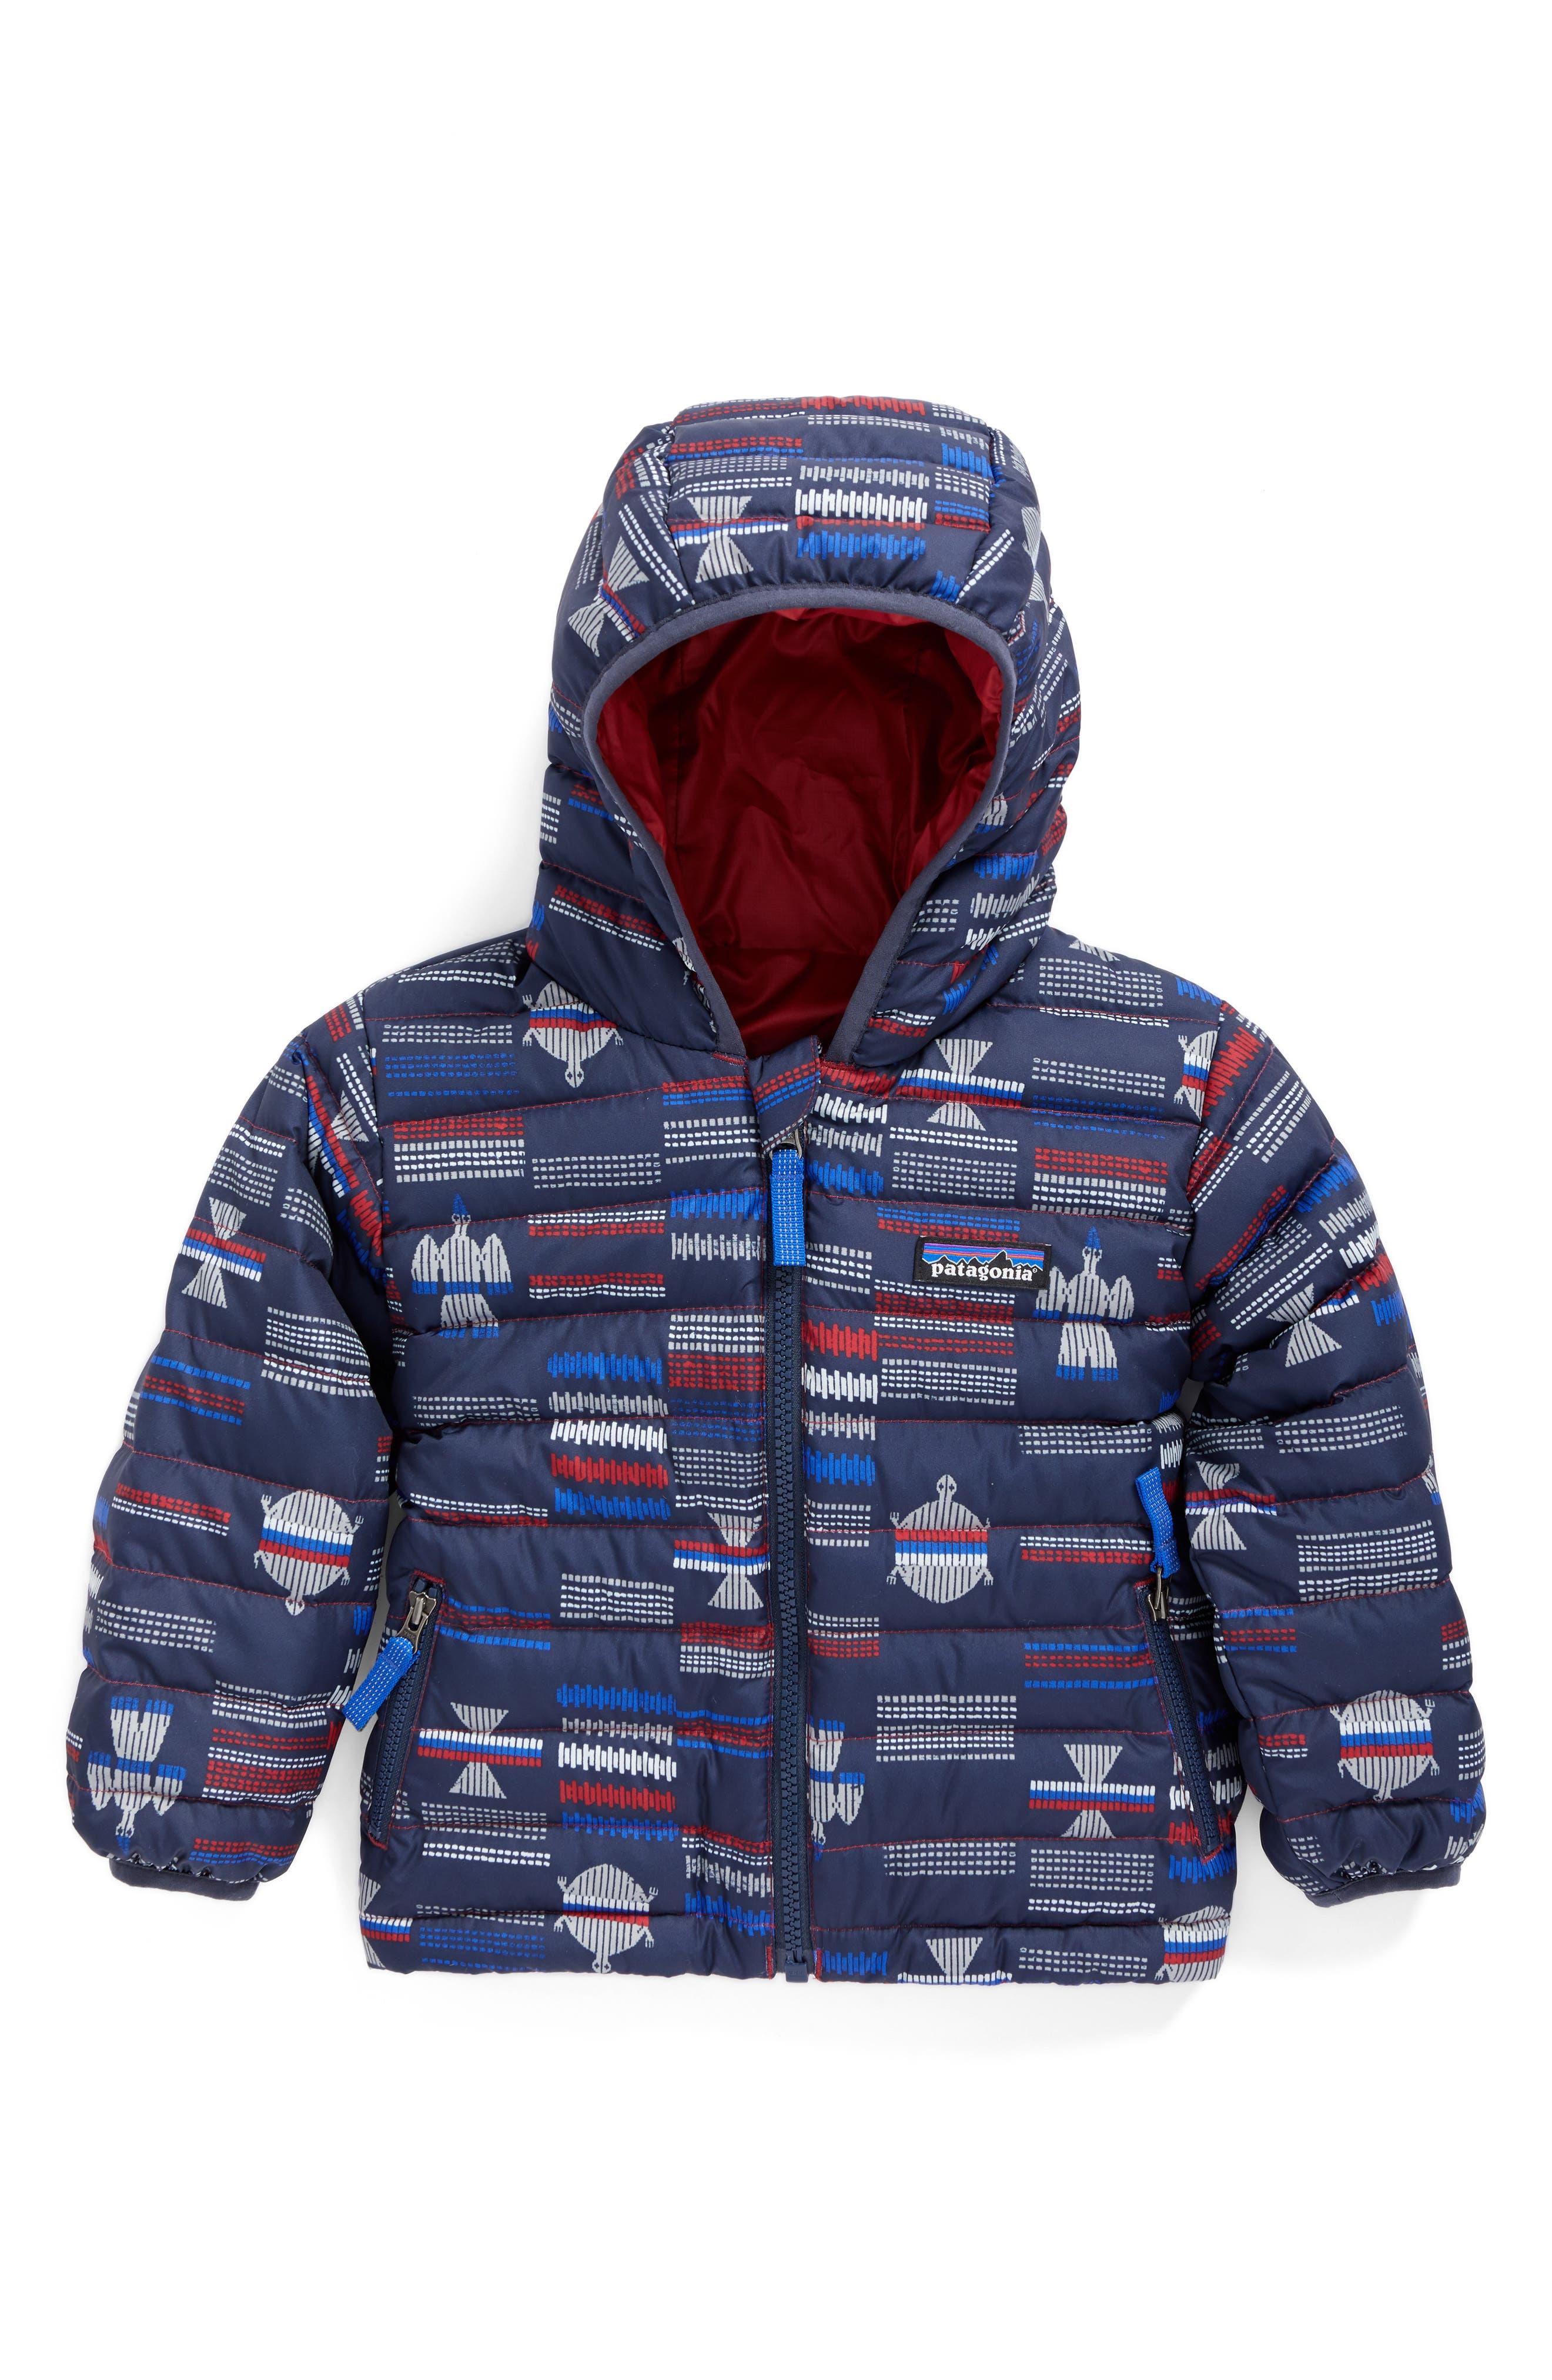 Alternate Image 1 Selected - Patagonia Reversible Down Sweater Hoodie (Baby Boys)